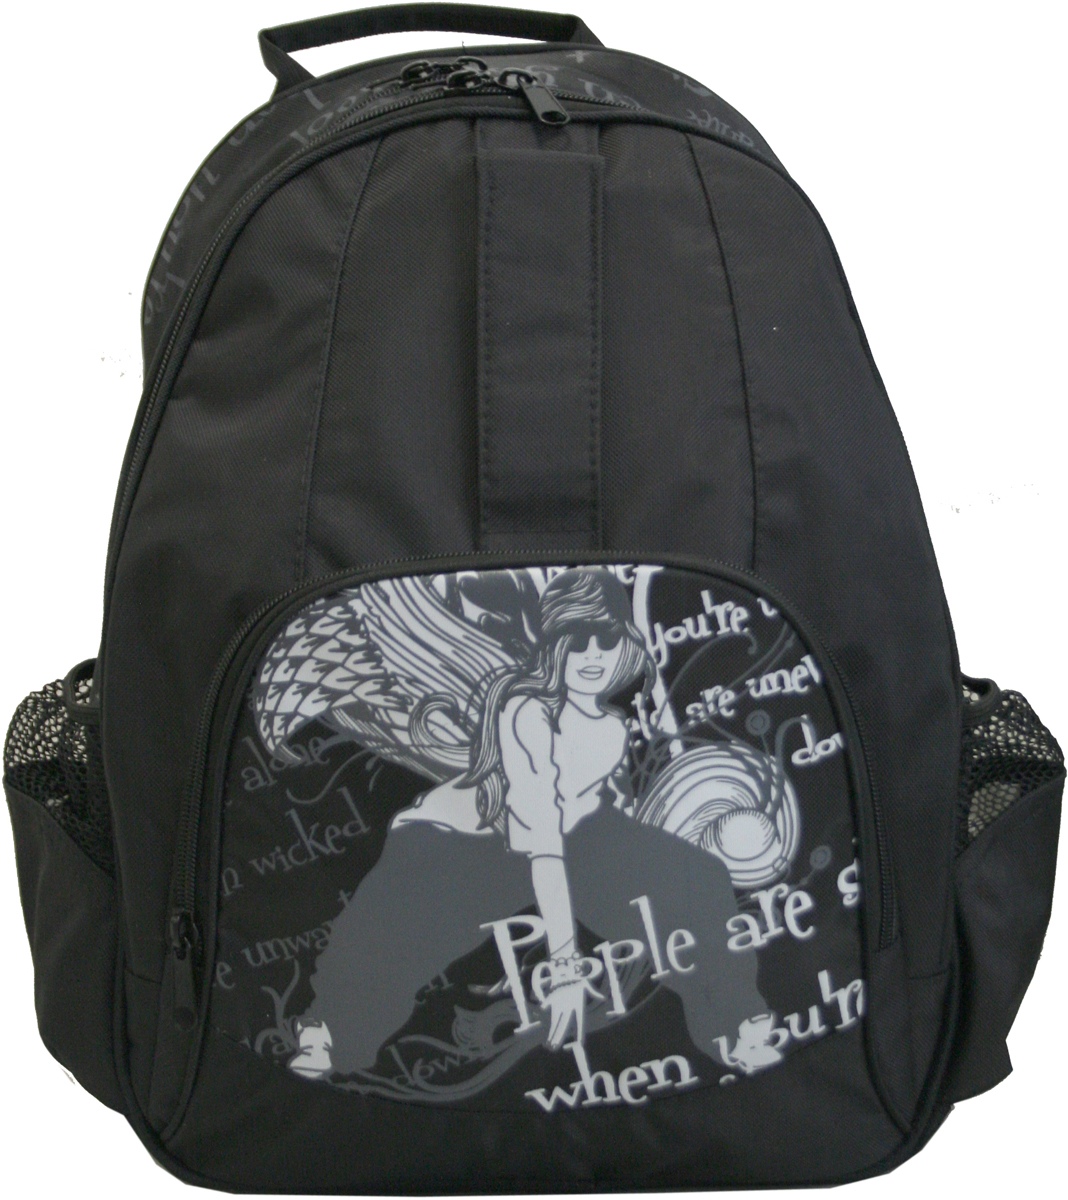 Рюкзак Antan Хип-хоп, цвет: черный. 6-13 antan 2 17l